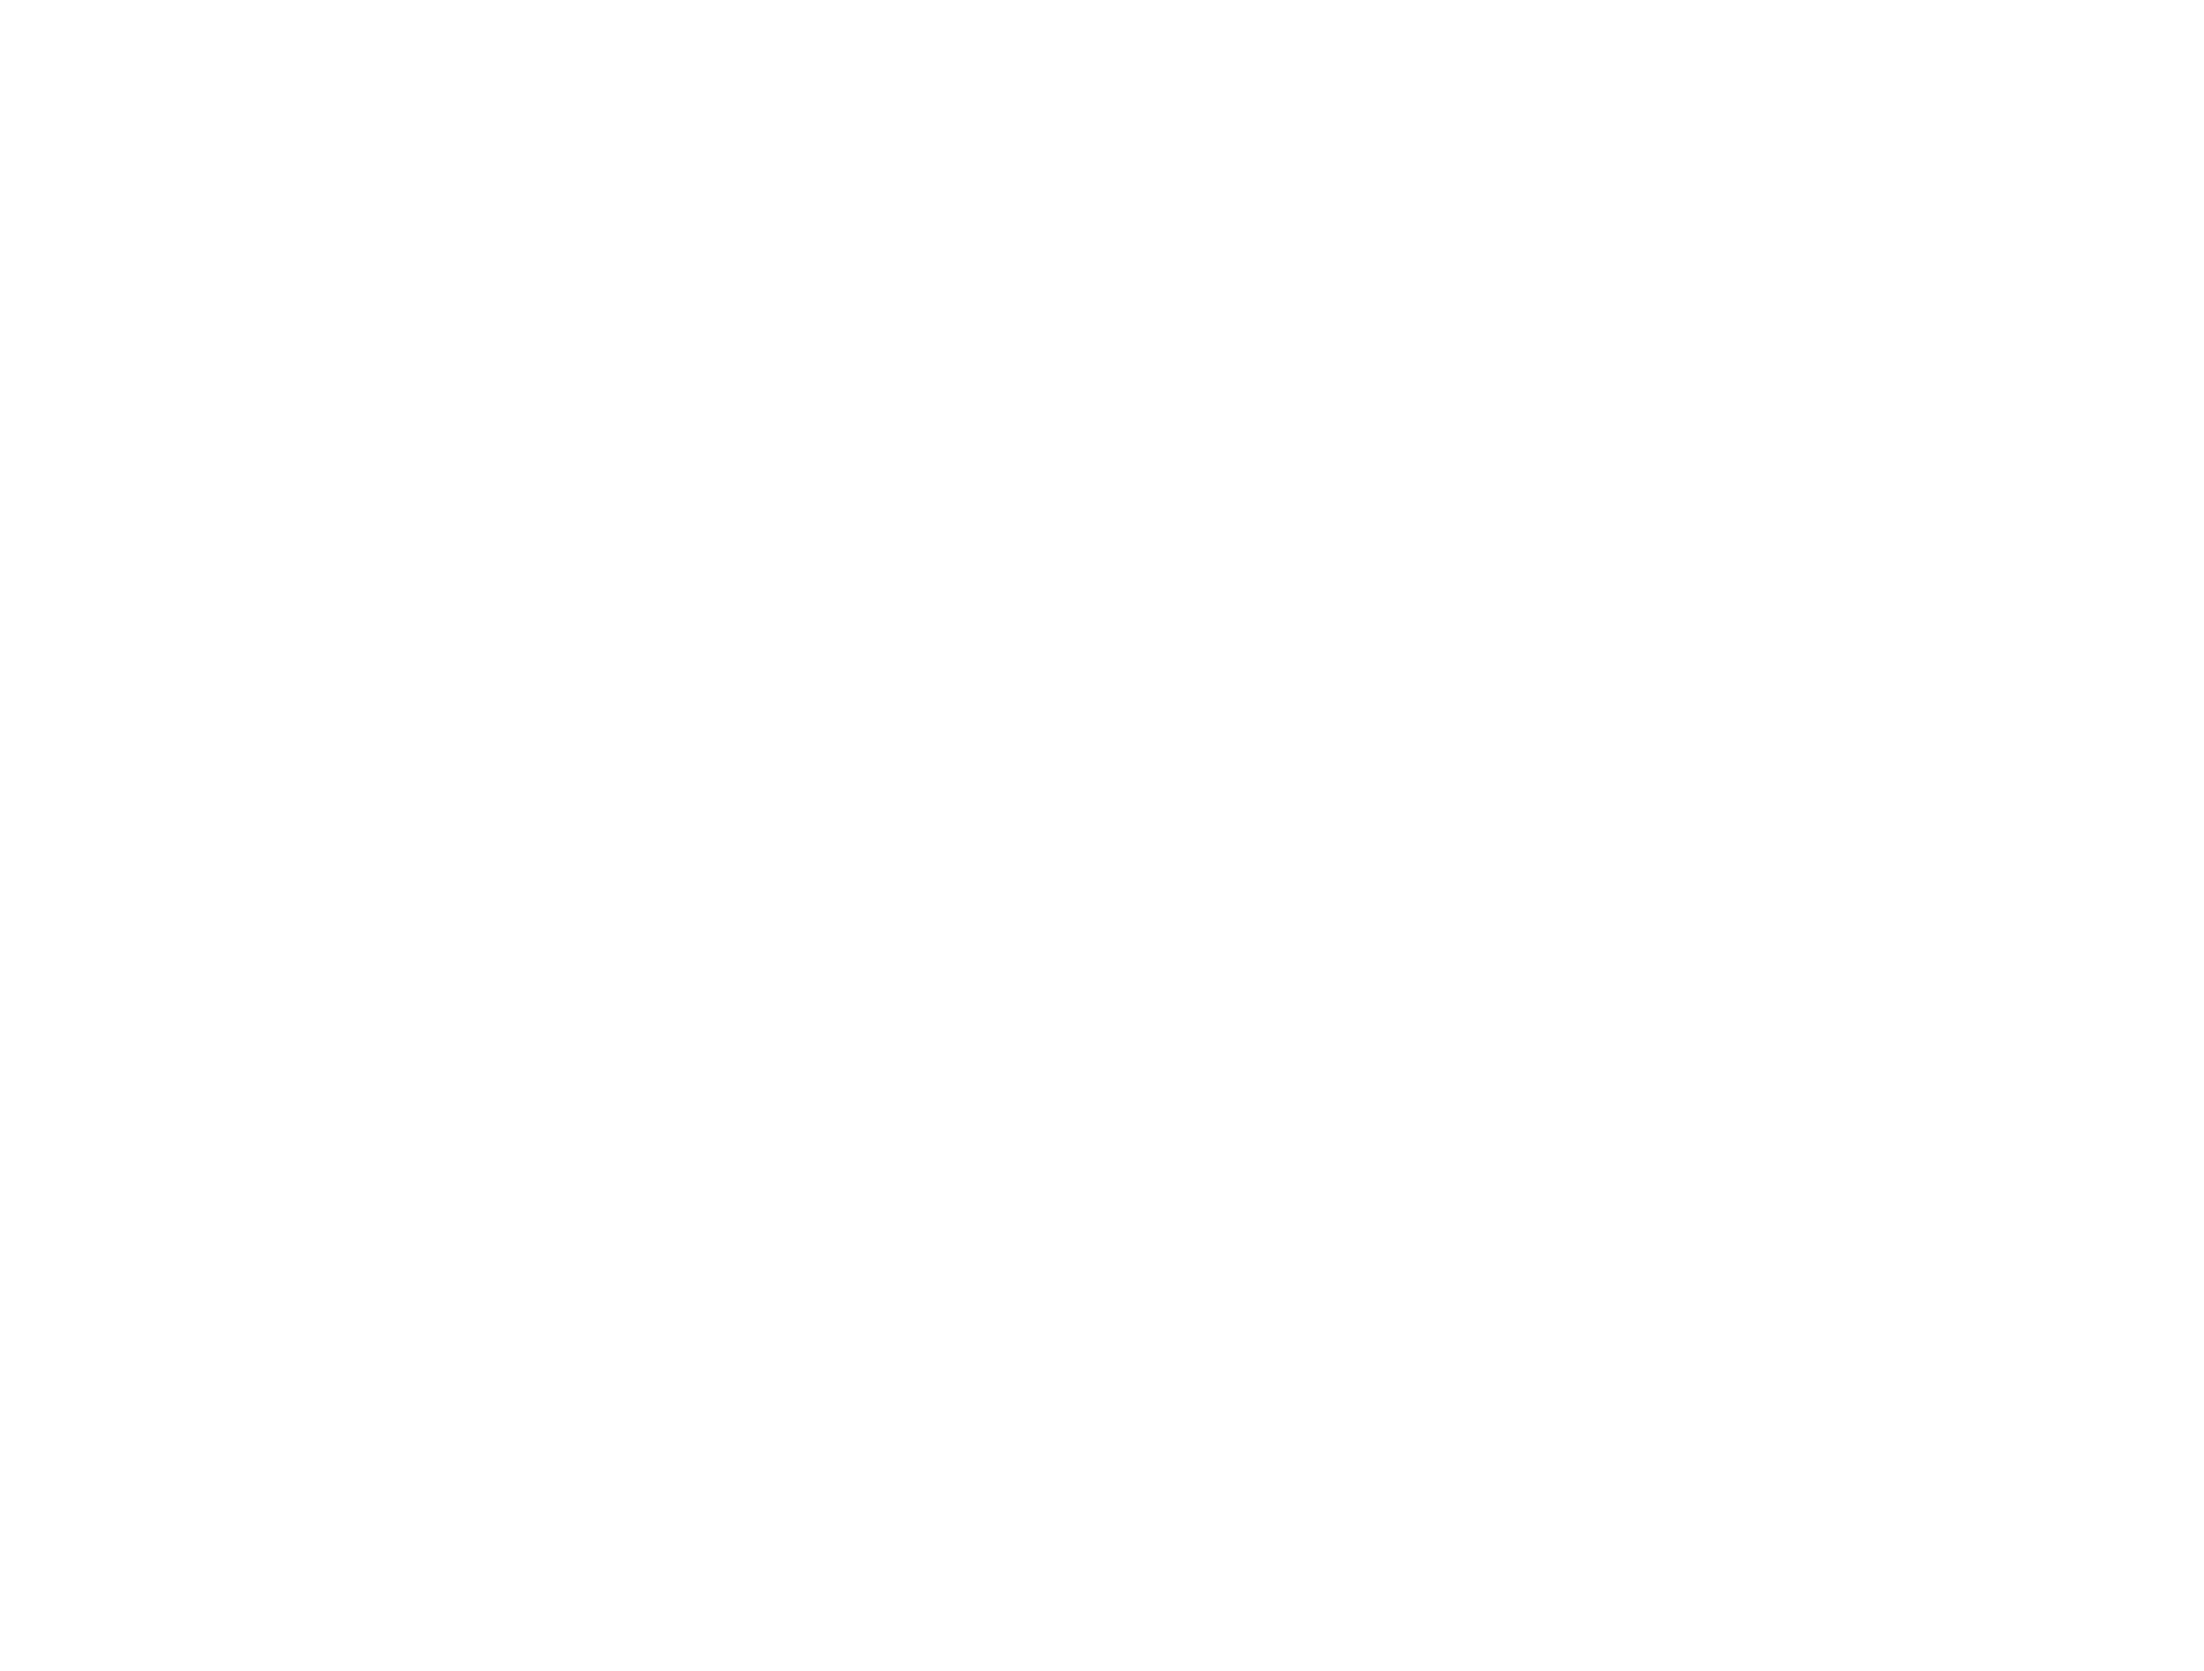 Logo capítulo In the wall